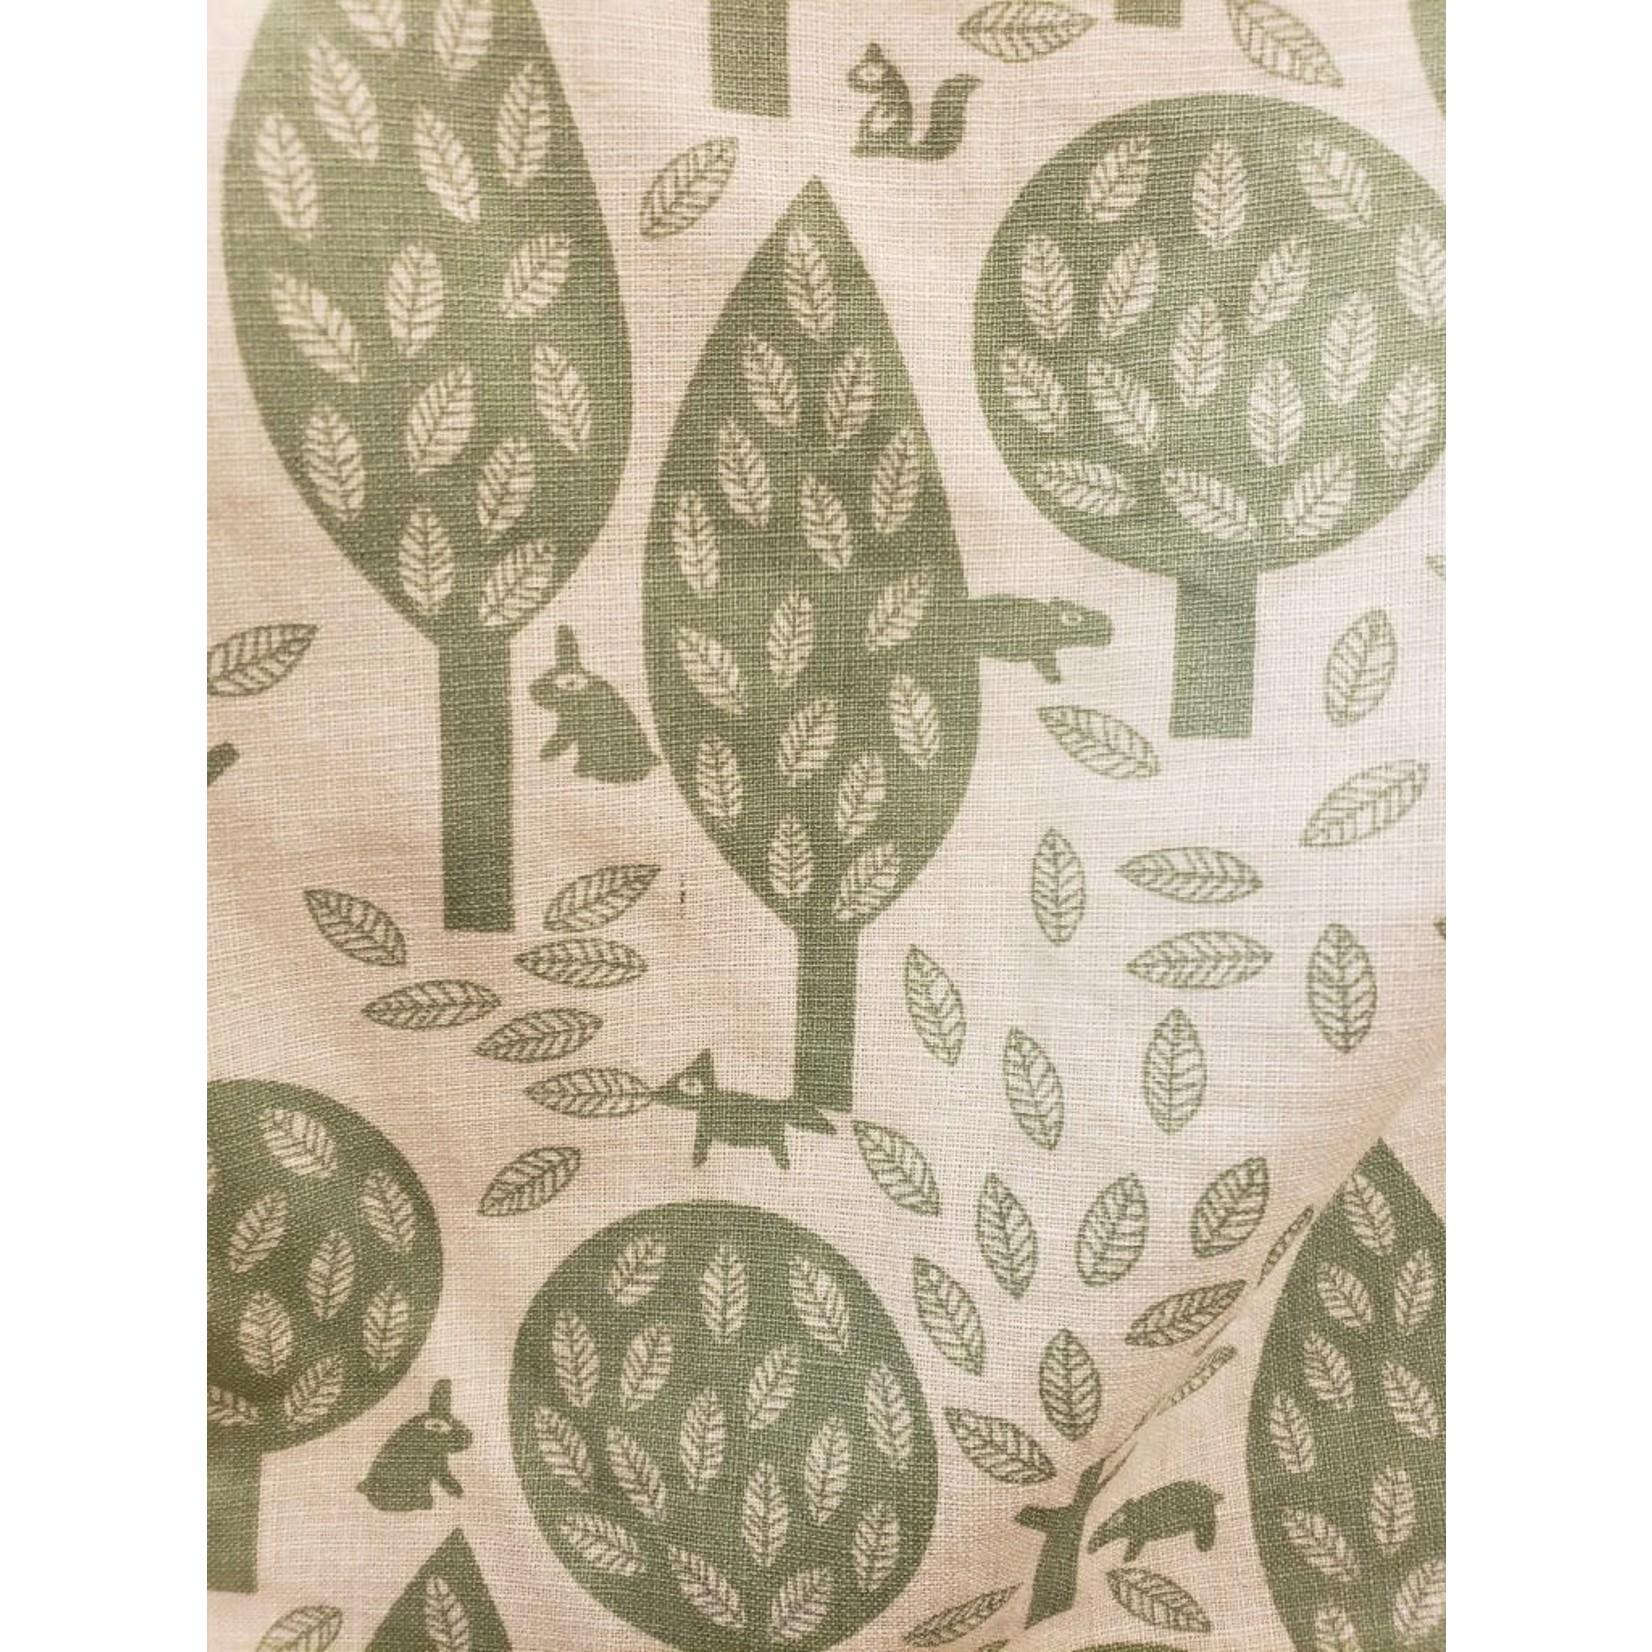 SM Wardrobe Tree/Squirrel Print Dress